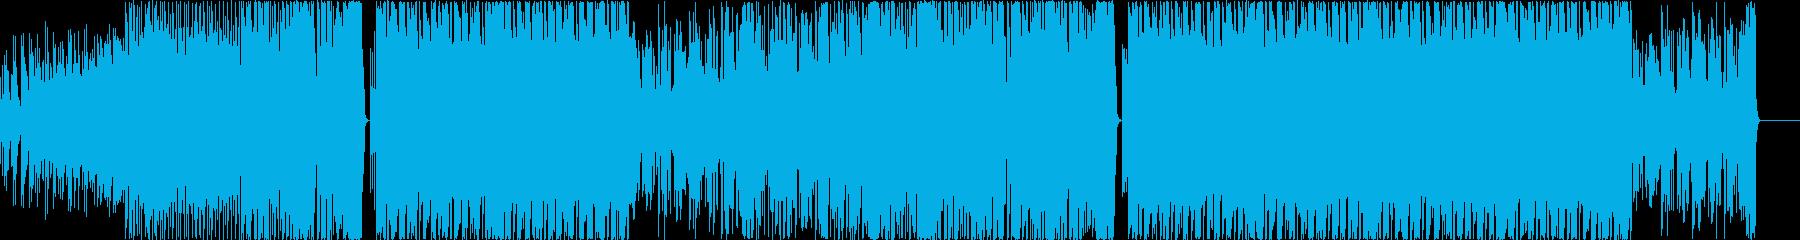 EDM系マシュメロ風スタイリッシな曲-9の再生済みの波形